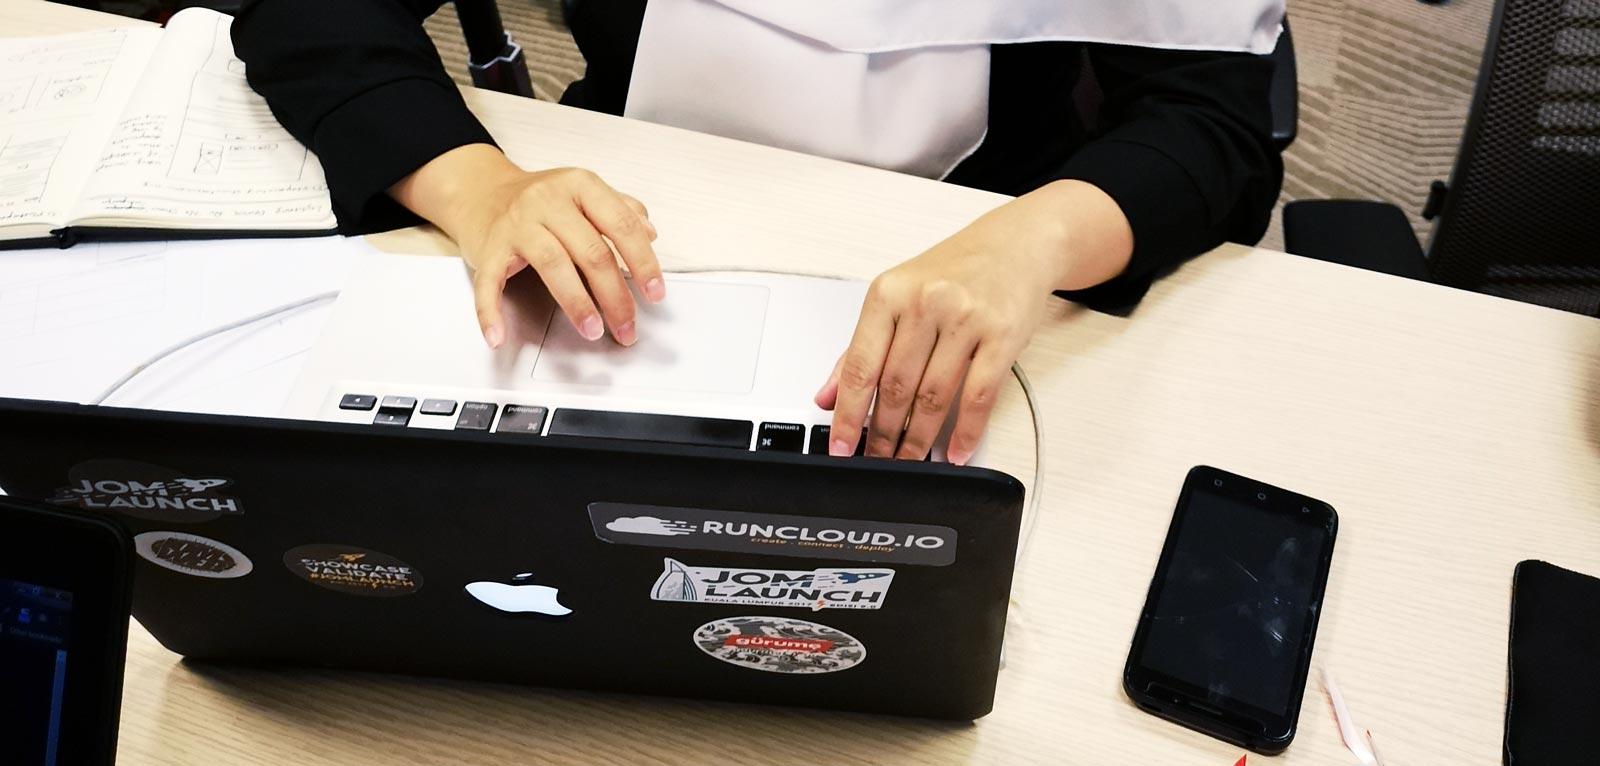 Macbook with stikcers